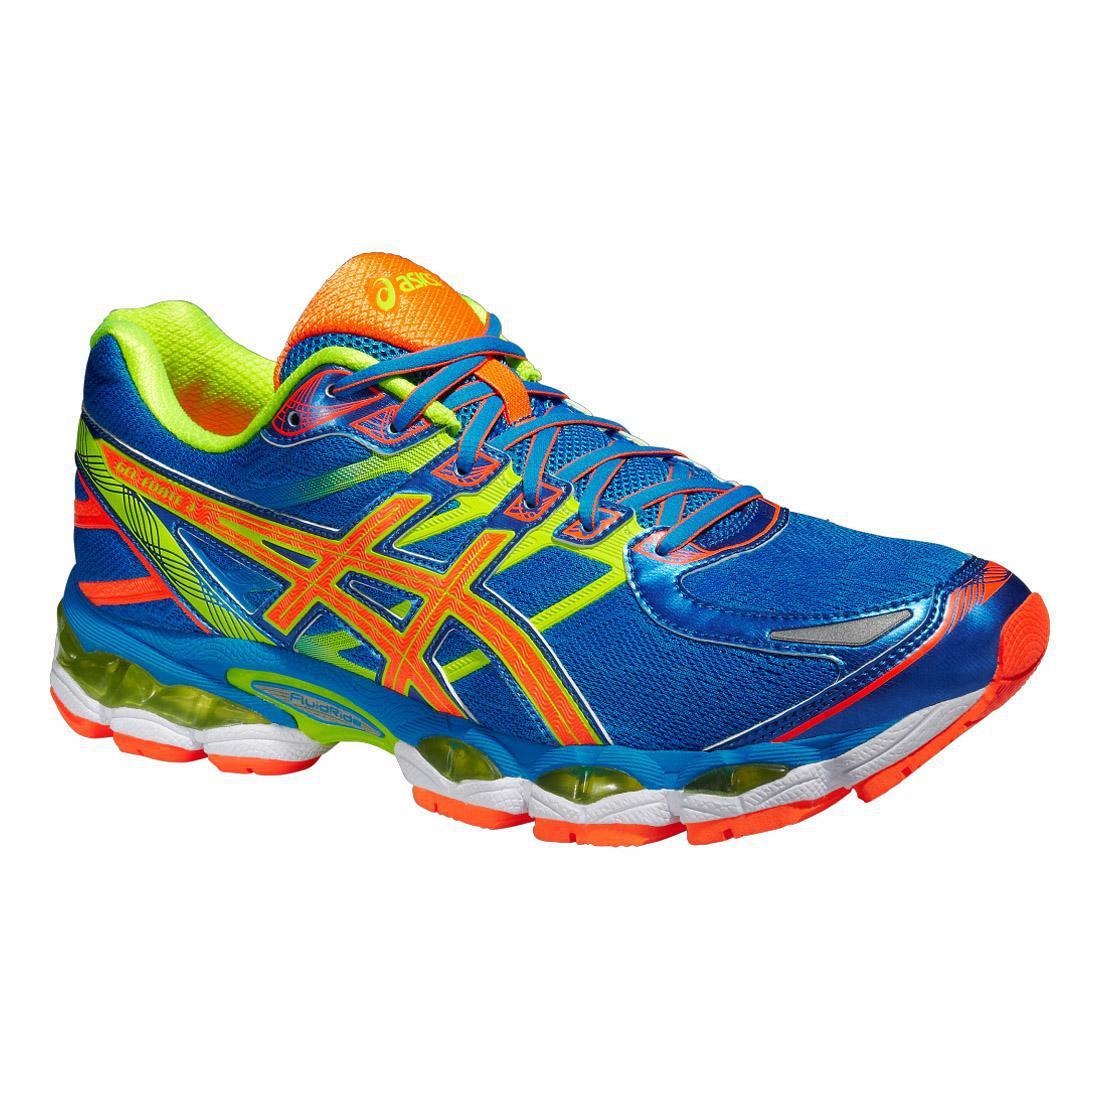 Asics Mens GEL-Evate 3 Running Shoes